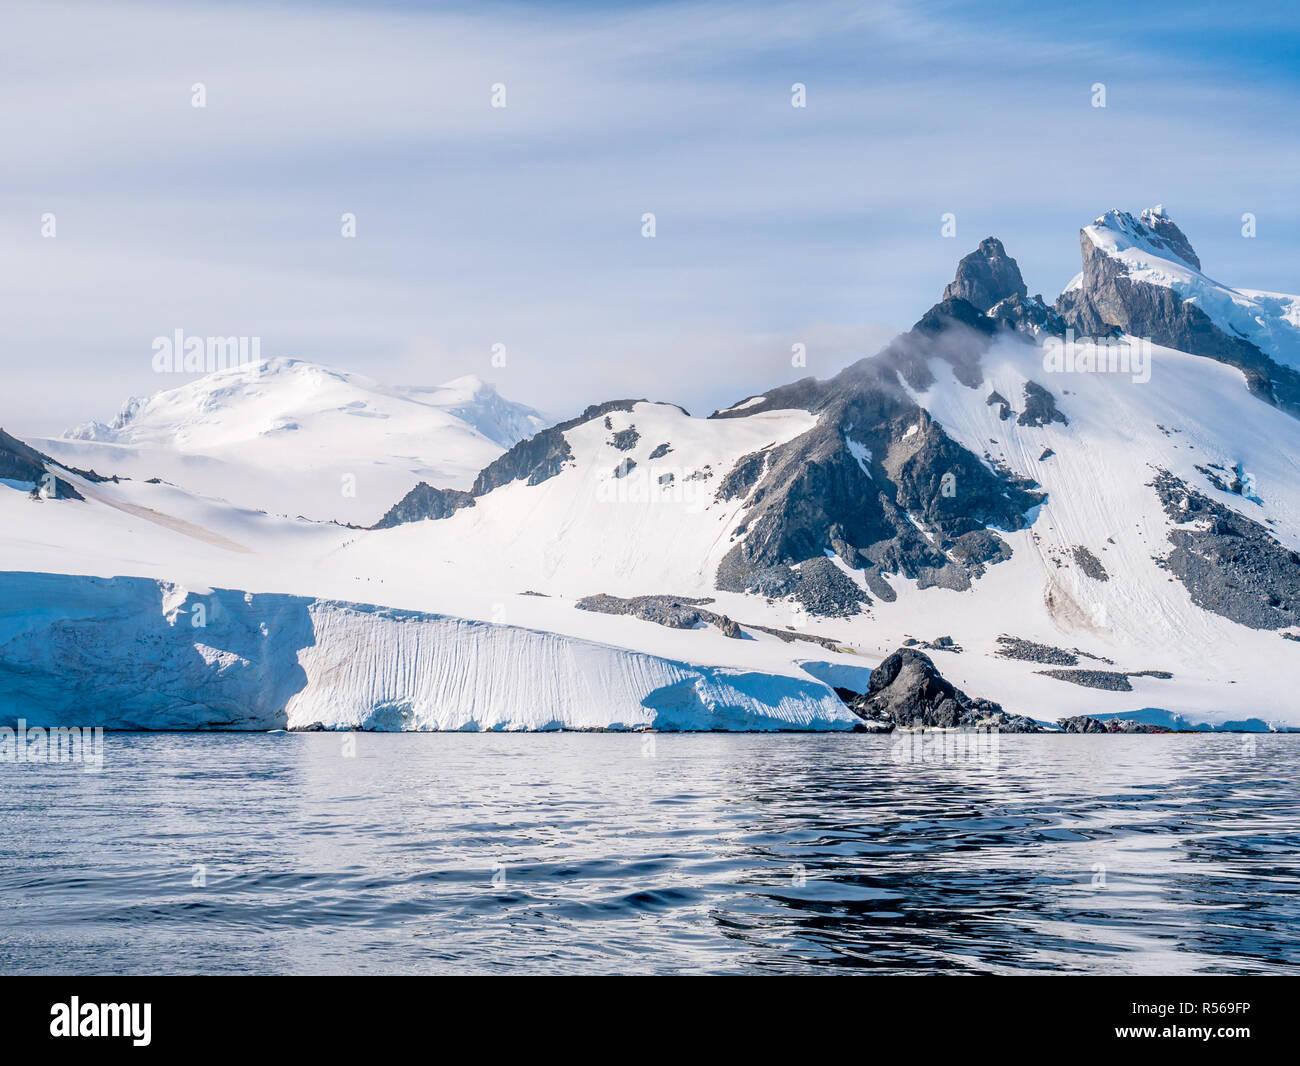 People walking on slope of Spigot Peak on Arctowski peninsula, Antarctic Peninsula, Antarctica Stock Photo